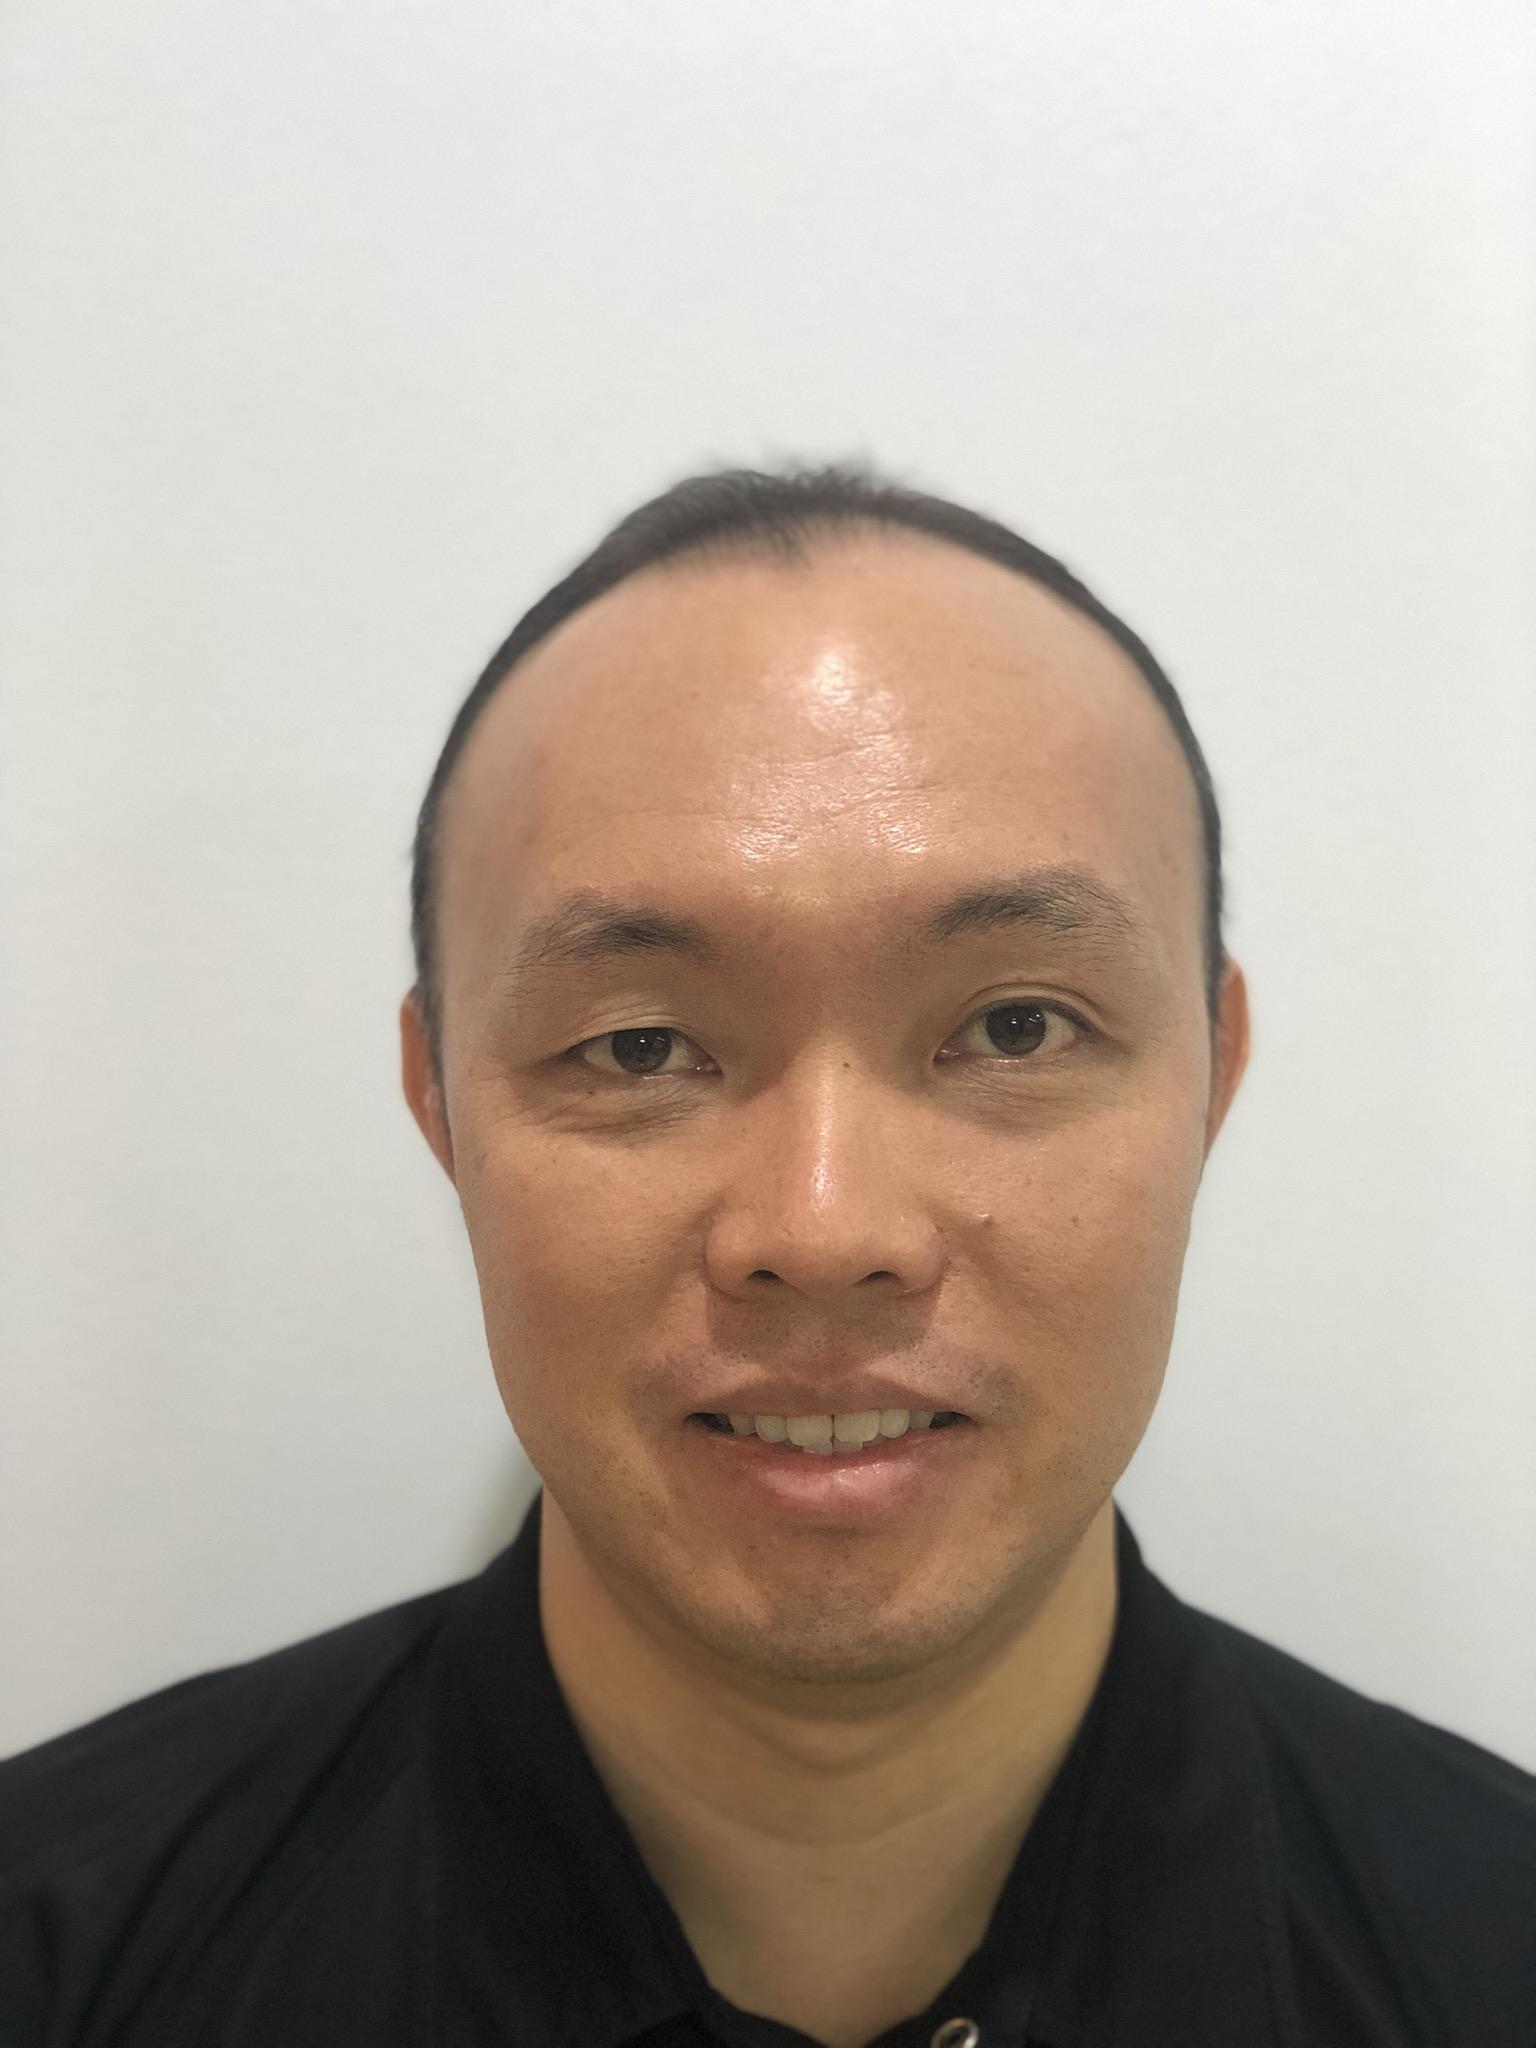 Leo Tan